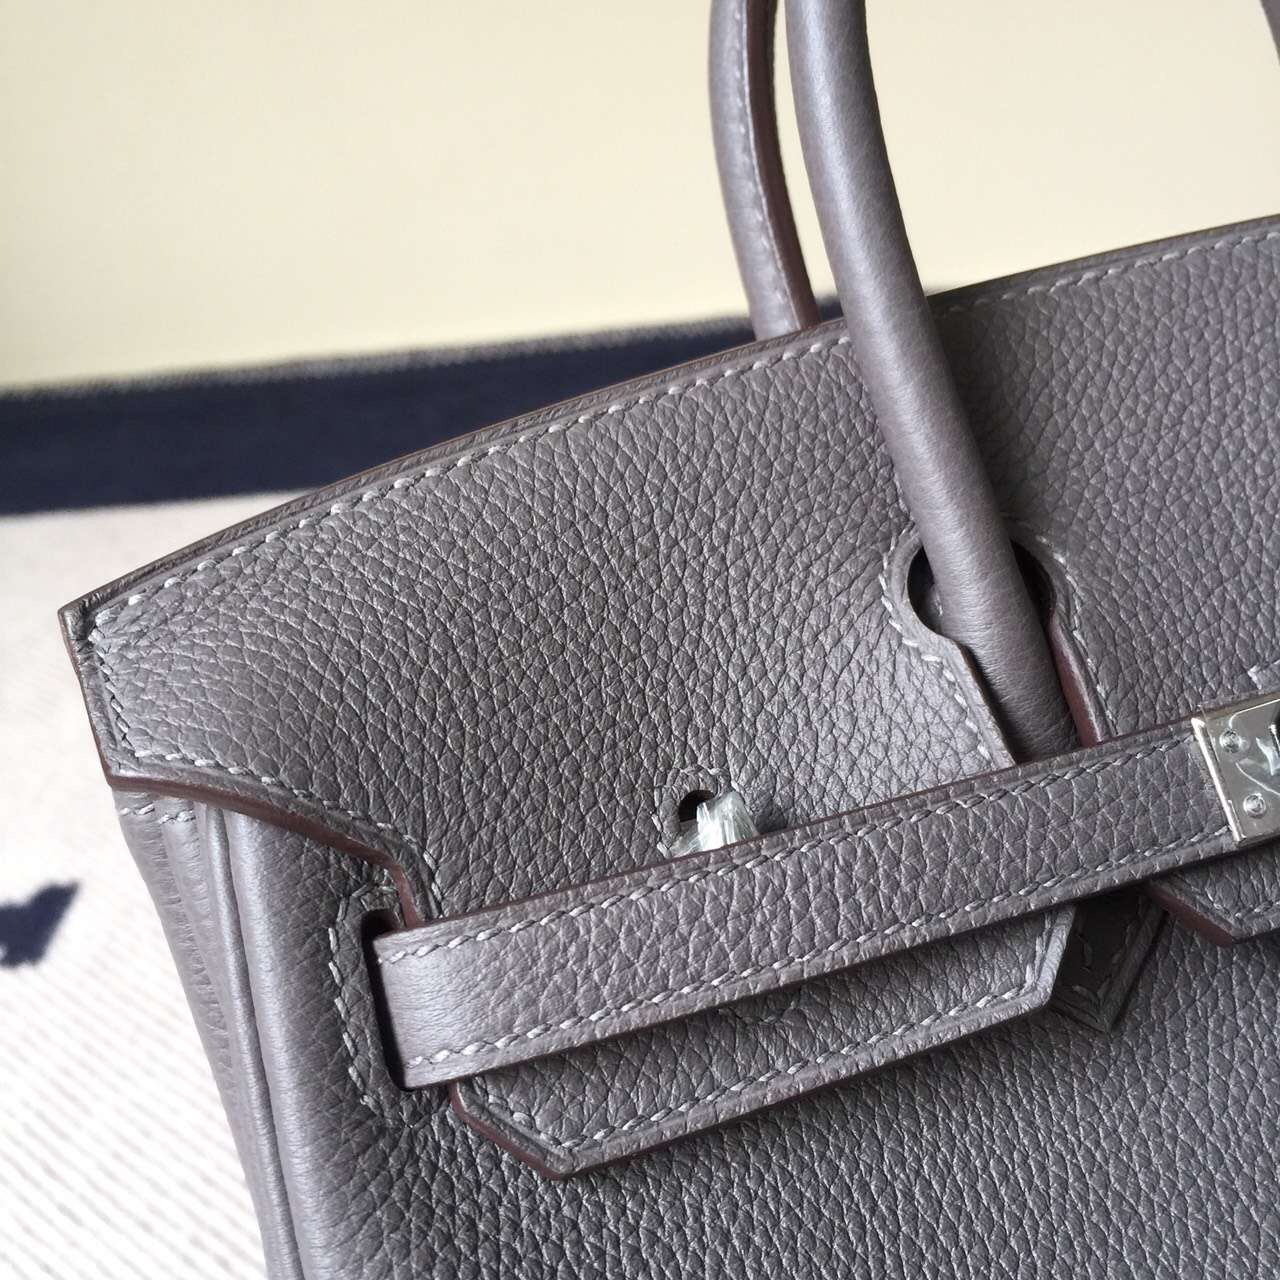 Discount Hermes 8F Etain Grey Togo Calf Leather Birkin Bag 25cm